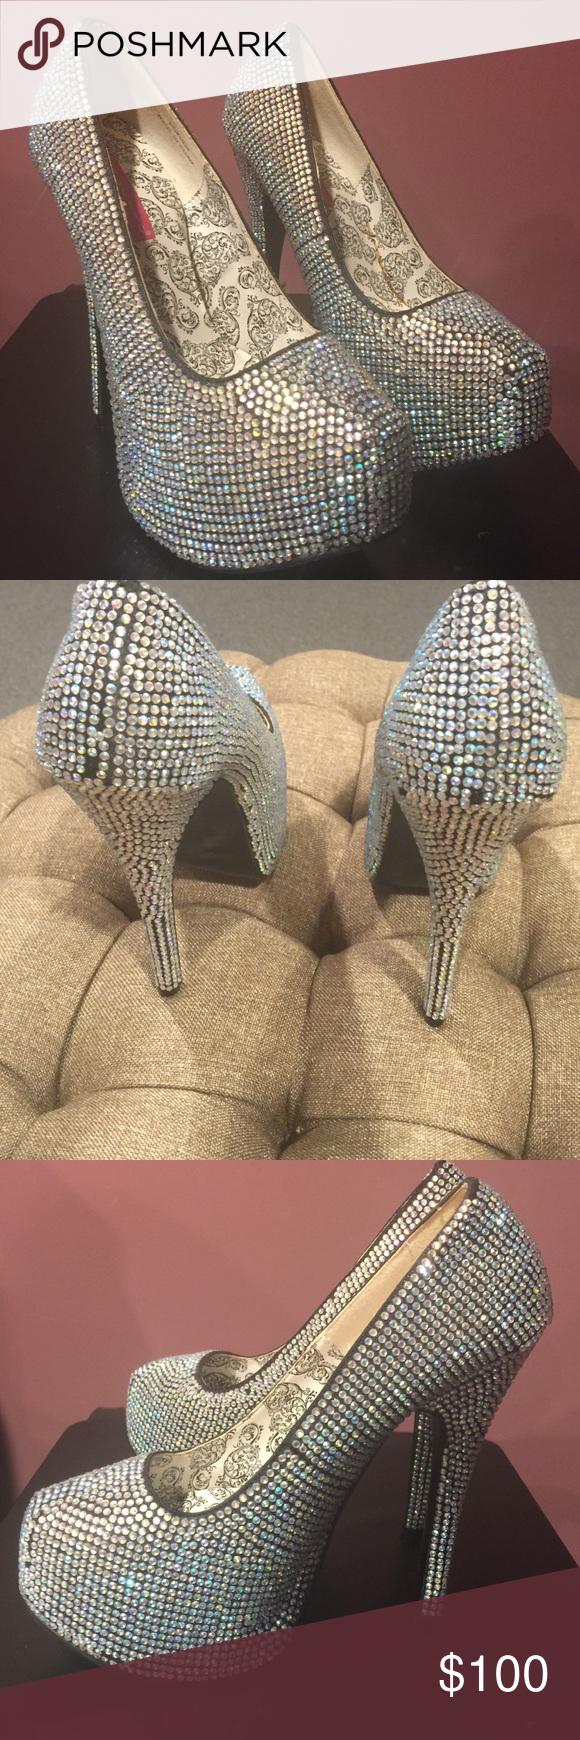 72759f95af11 Bordello silver Iridescent rhinestone heels The color is silver satin